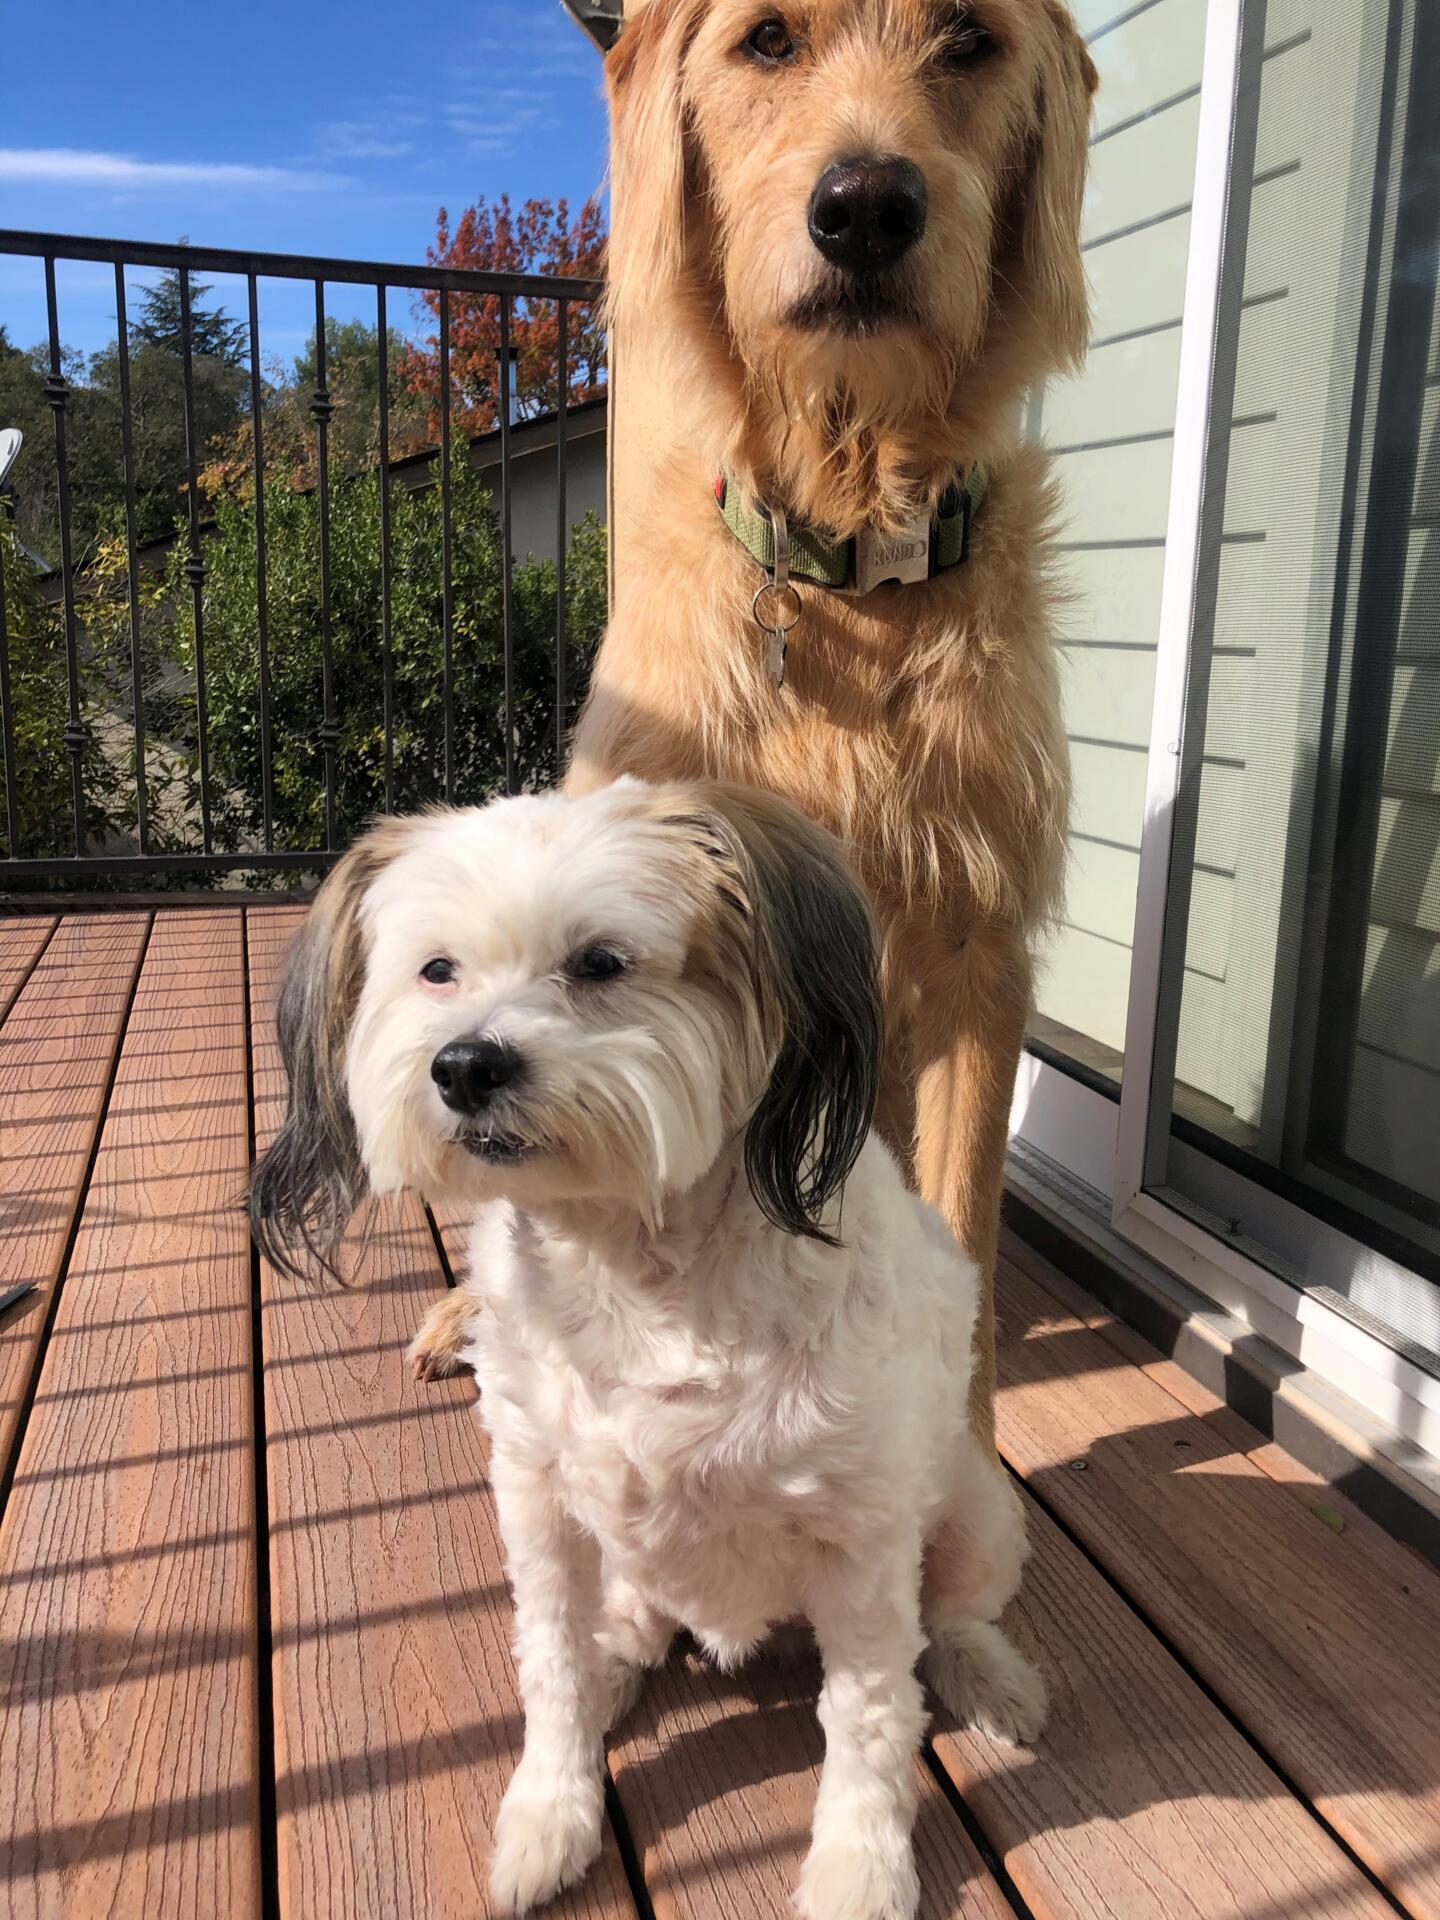 Coco and friend